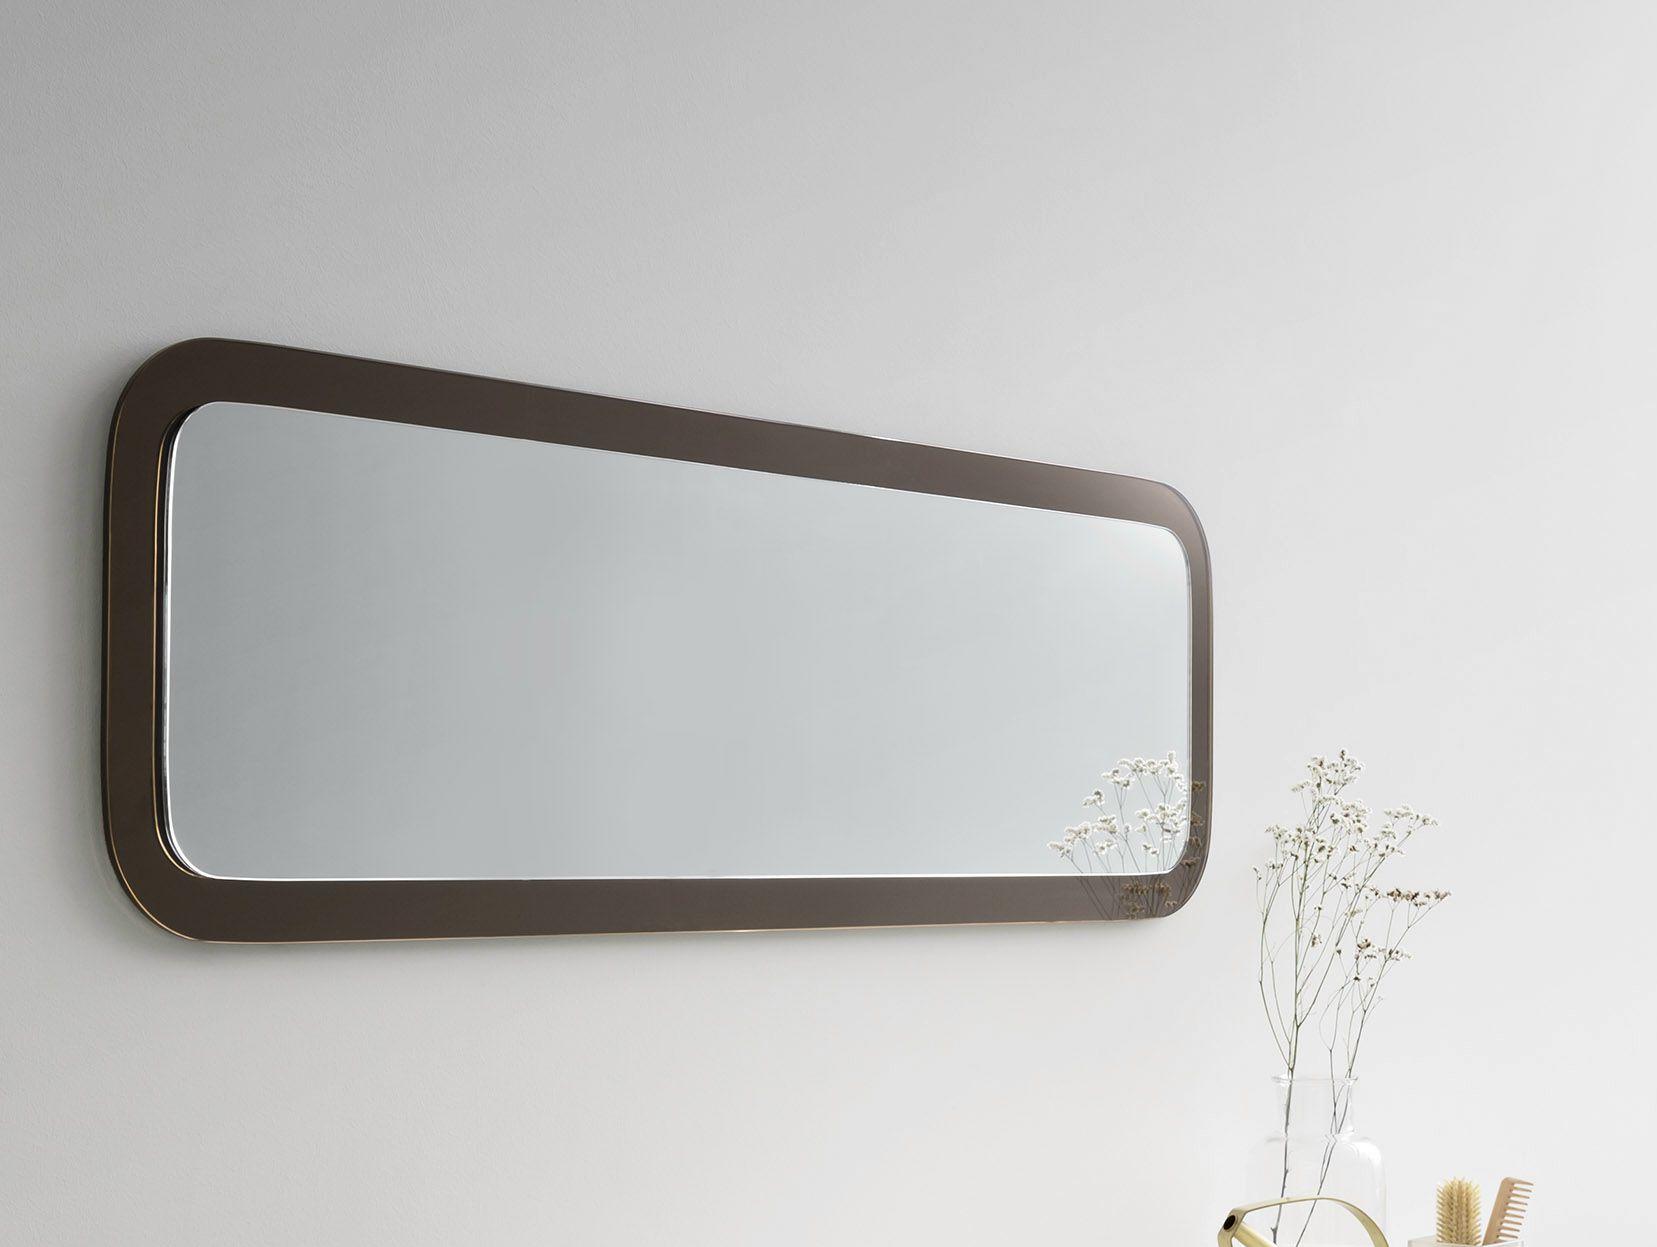 Miroir mural brame miroir rectangulaire by rexa design for Miroir mural rectangulaire design